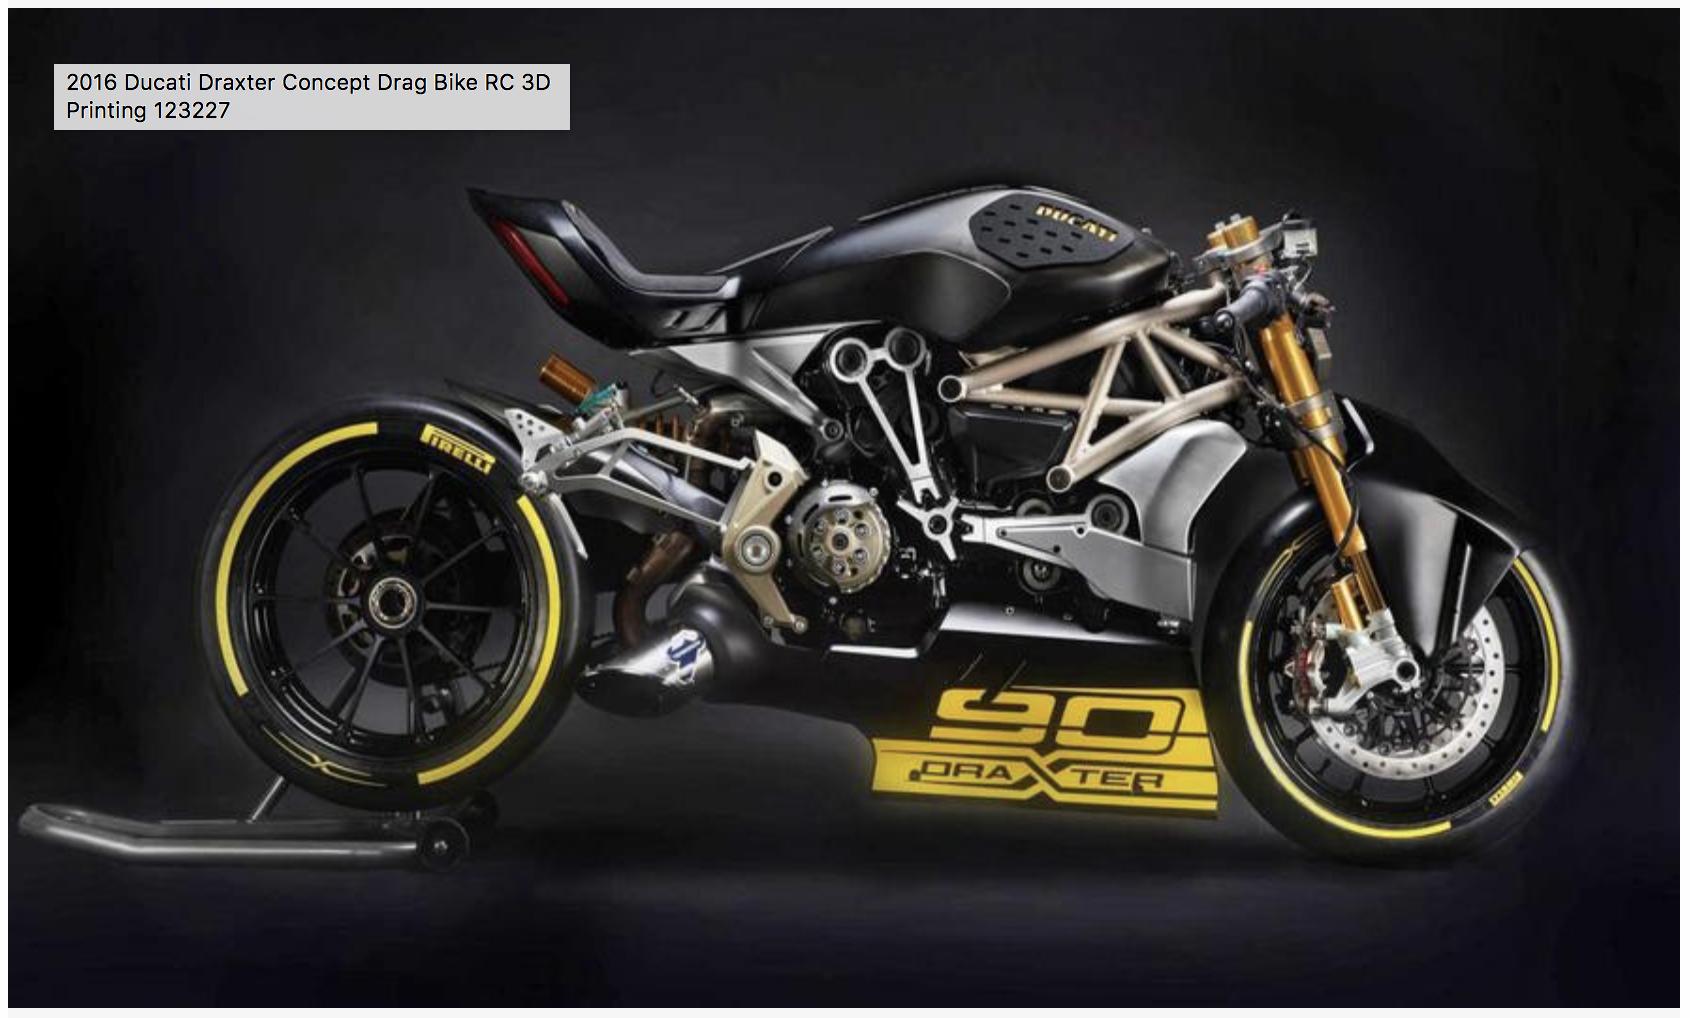 Screen Shot 2017-02-10 at 9.29.27 AM.png Download free STL file 2016 Ducati Draxter Concept Drag Bike RC • 3D printer template, brett